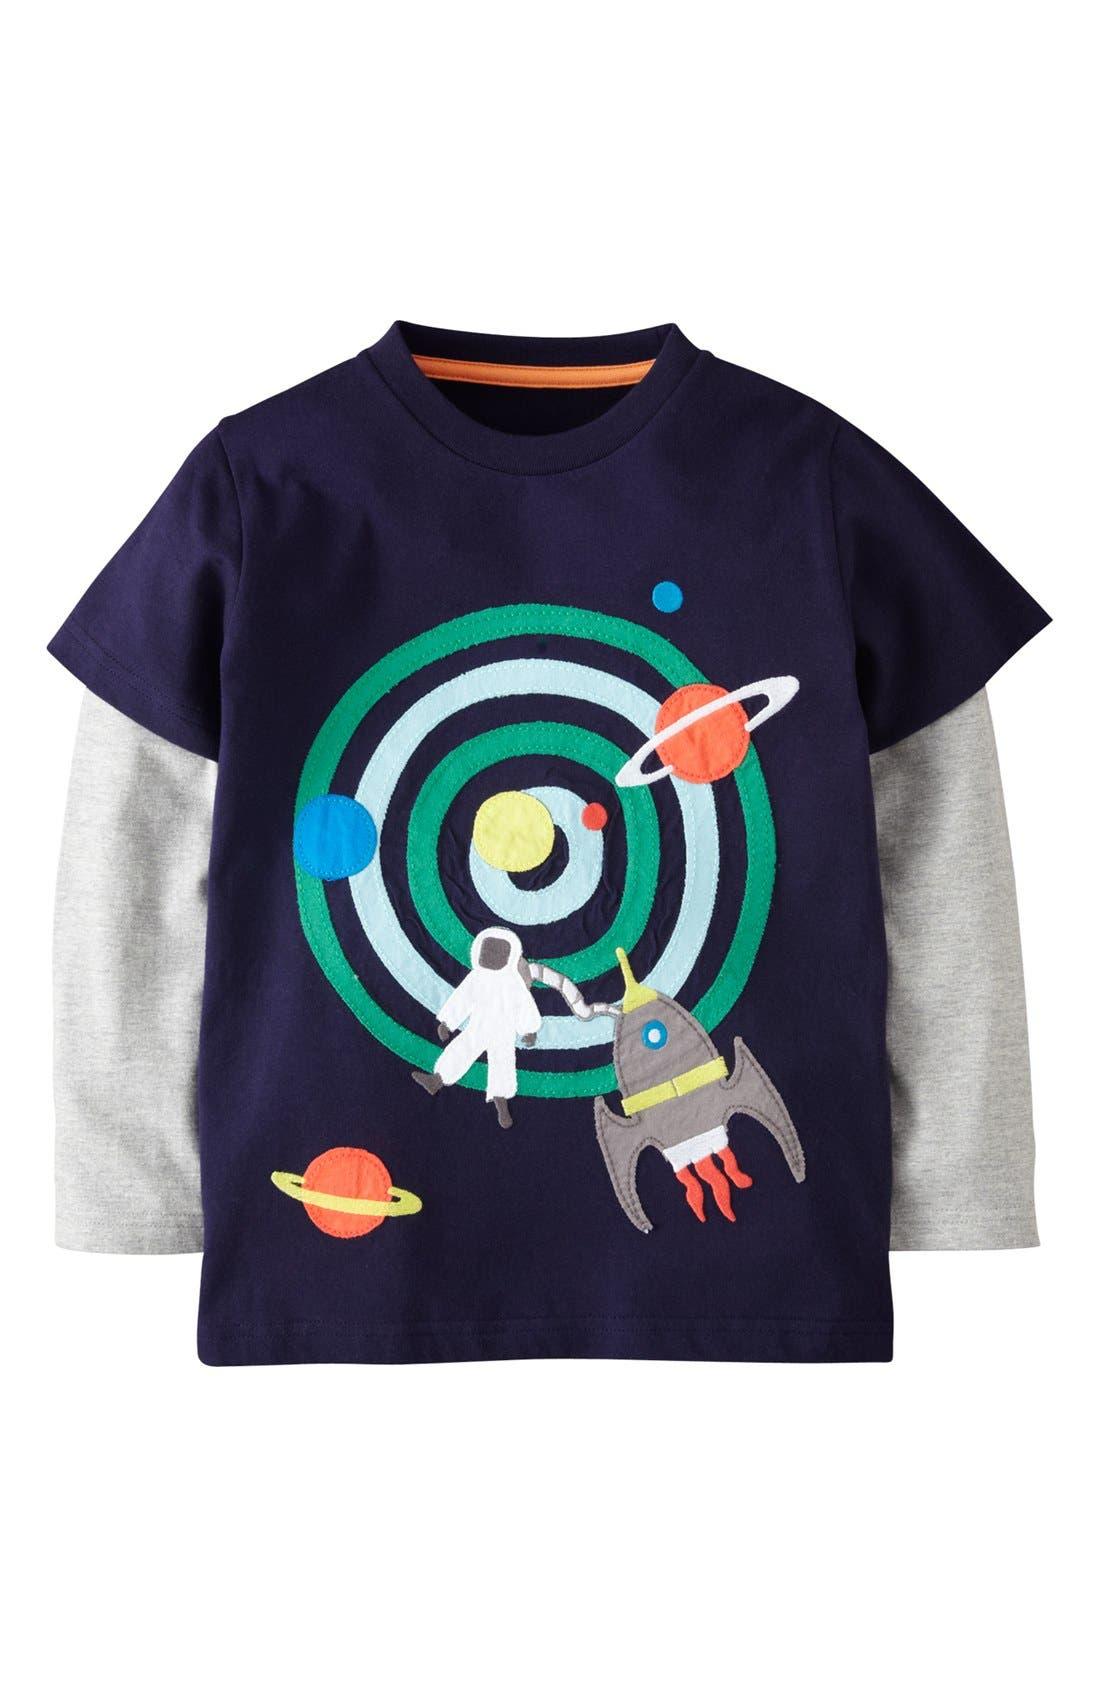 Alternate Image 1 Selected - Mini Boden Layered Long Sleeve T-Shirt (Toddler Boys, Little Boys & Big Boys)